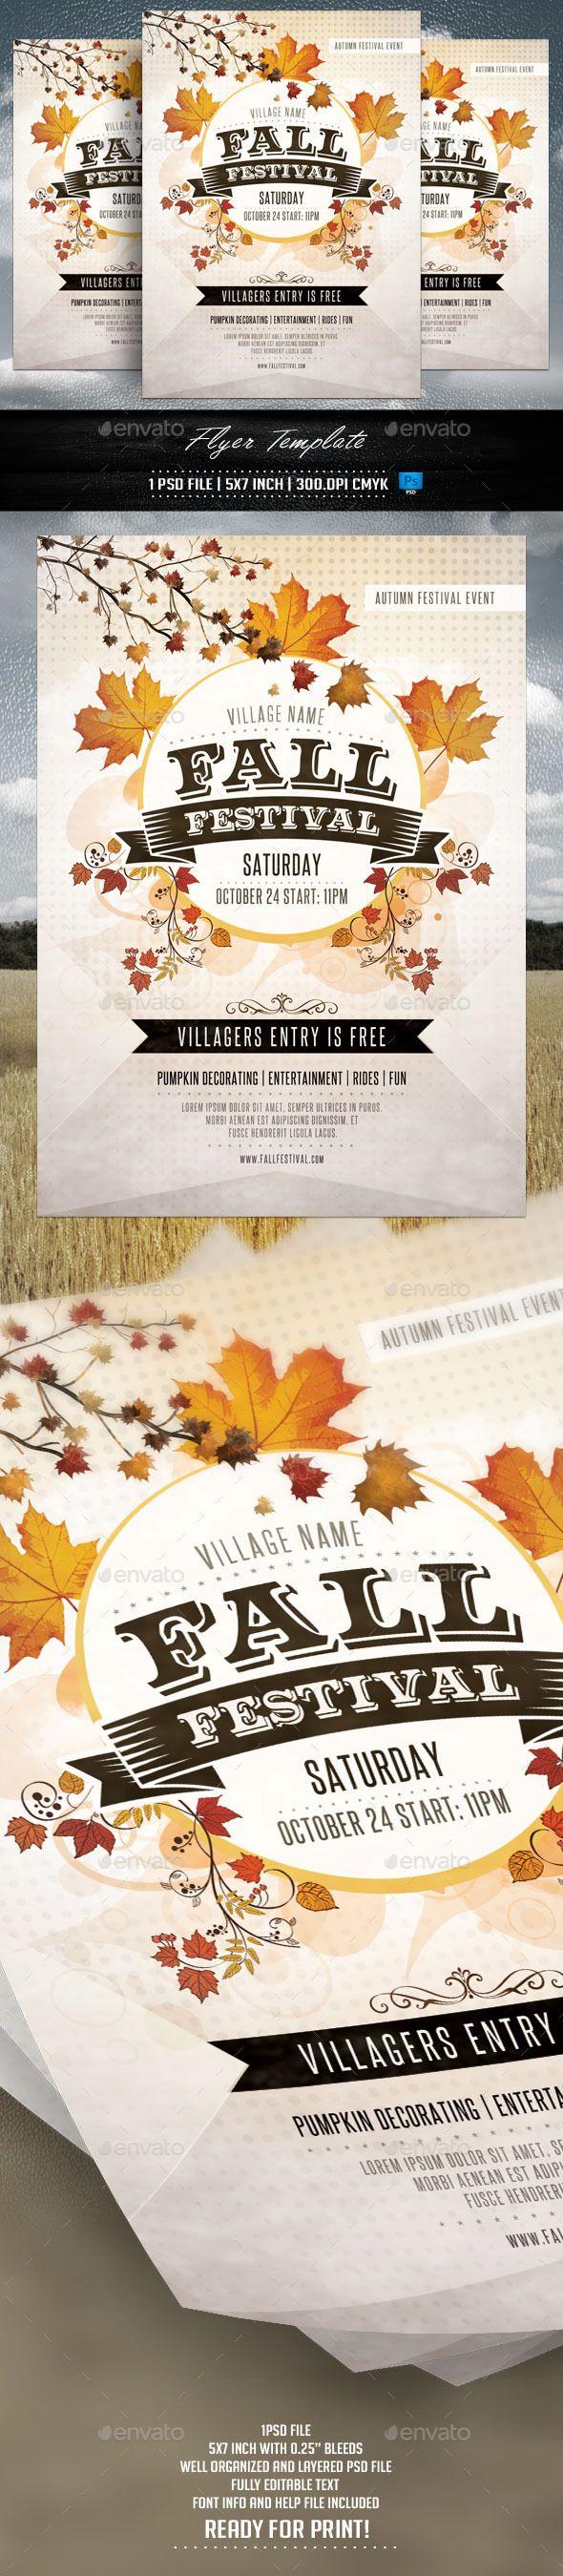 Fall Festival Flyer Template #design Download: http://graphicriver.net/item/fall-festival-flyer-template/12750913?ref=ksioks